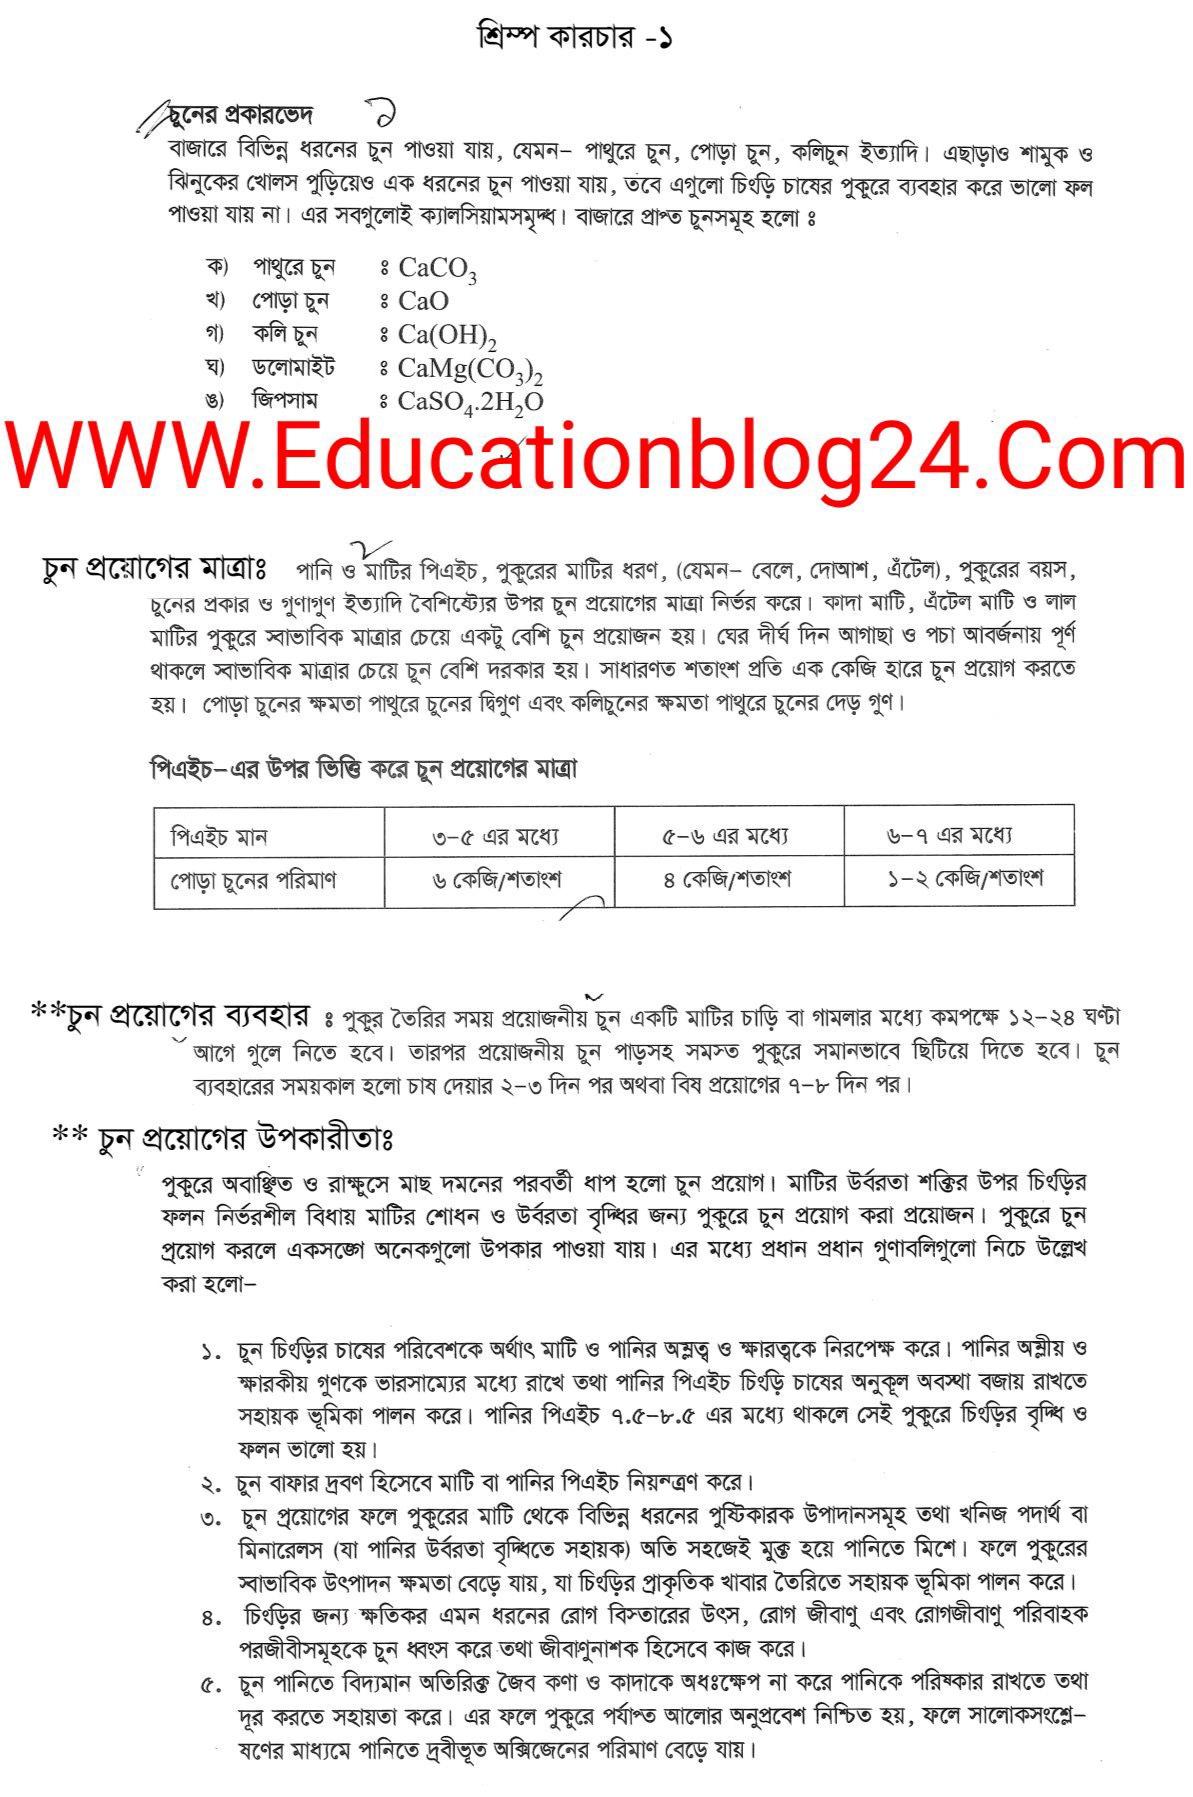 SSC / Dakhil (Vocational) Shrimp Culture and Breeding Assignment Answer 2021 14